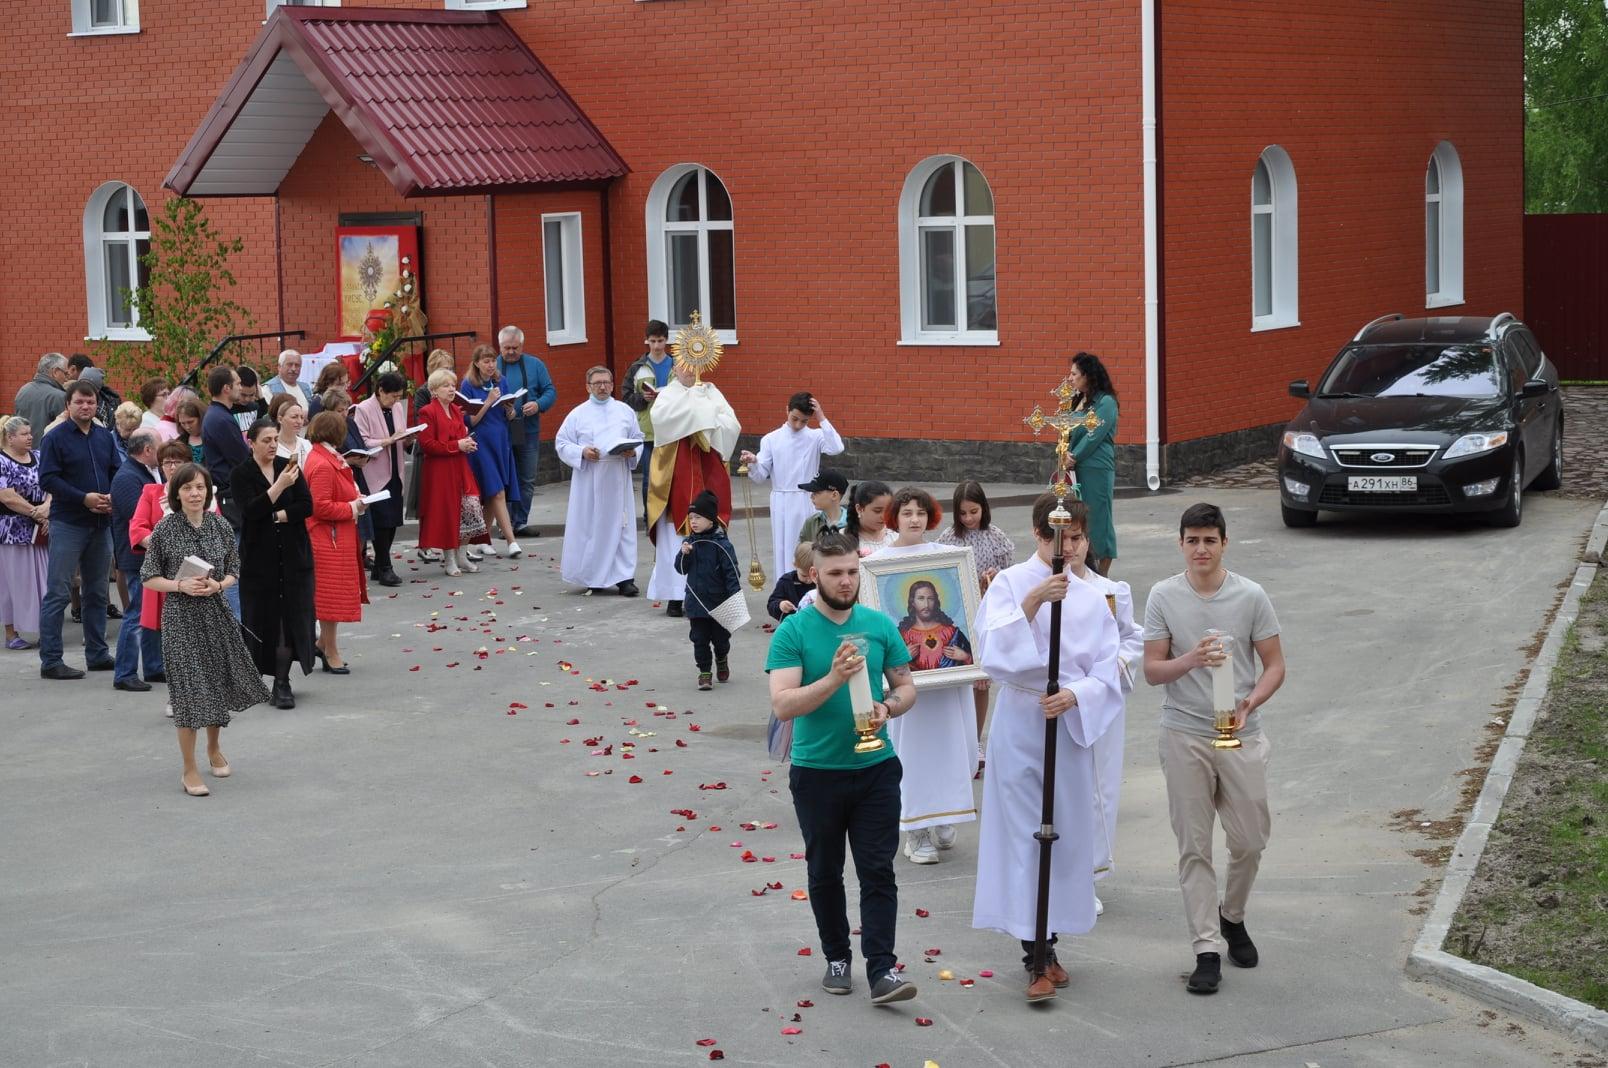 Евхаристические процессии в Сургуте и Челябинске (ФОТО)